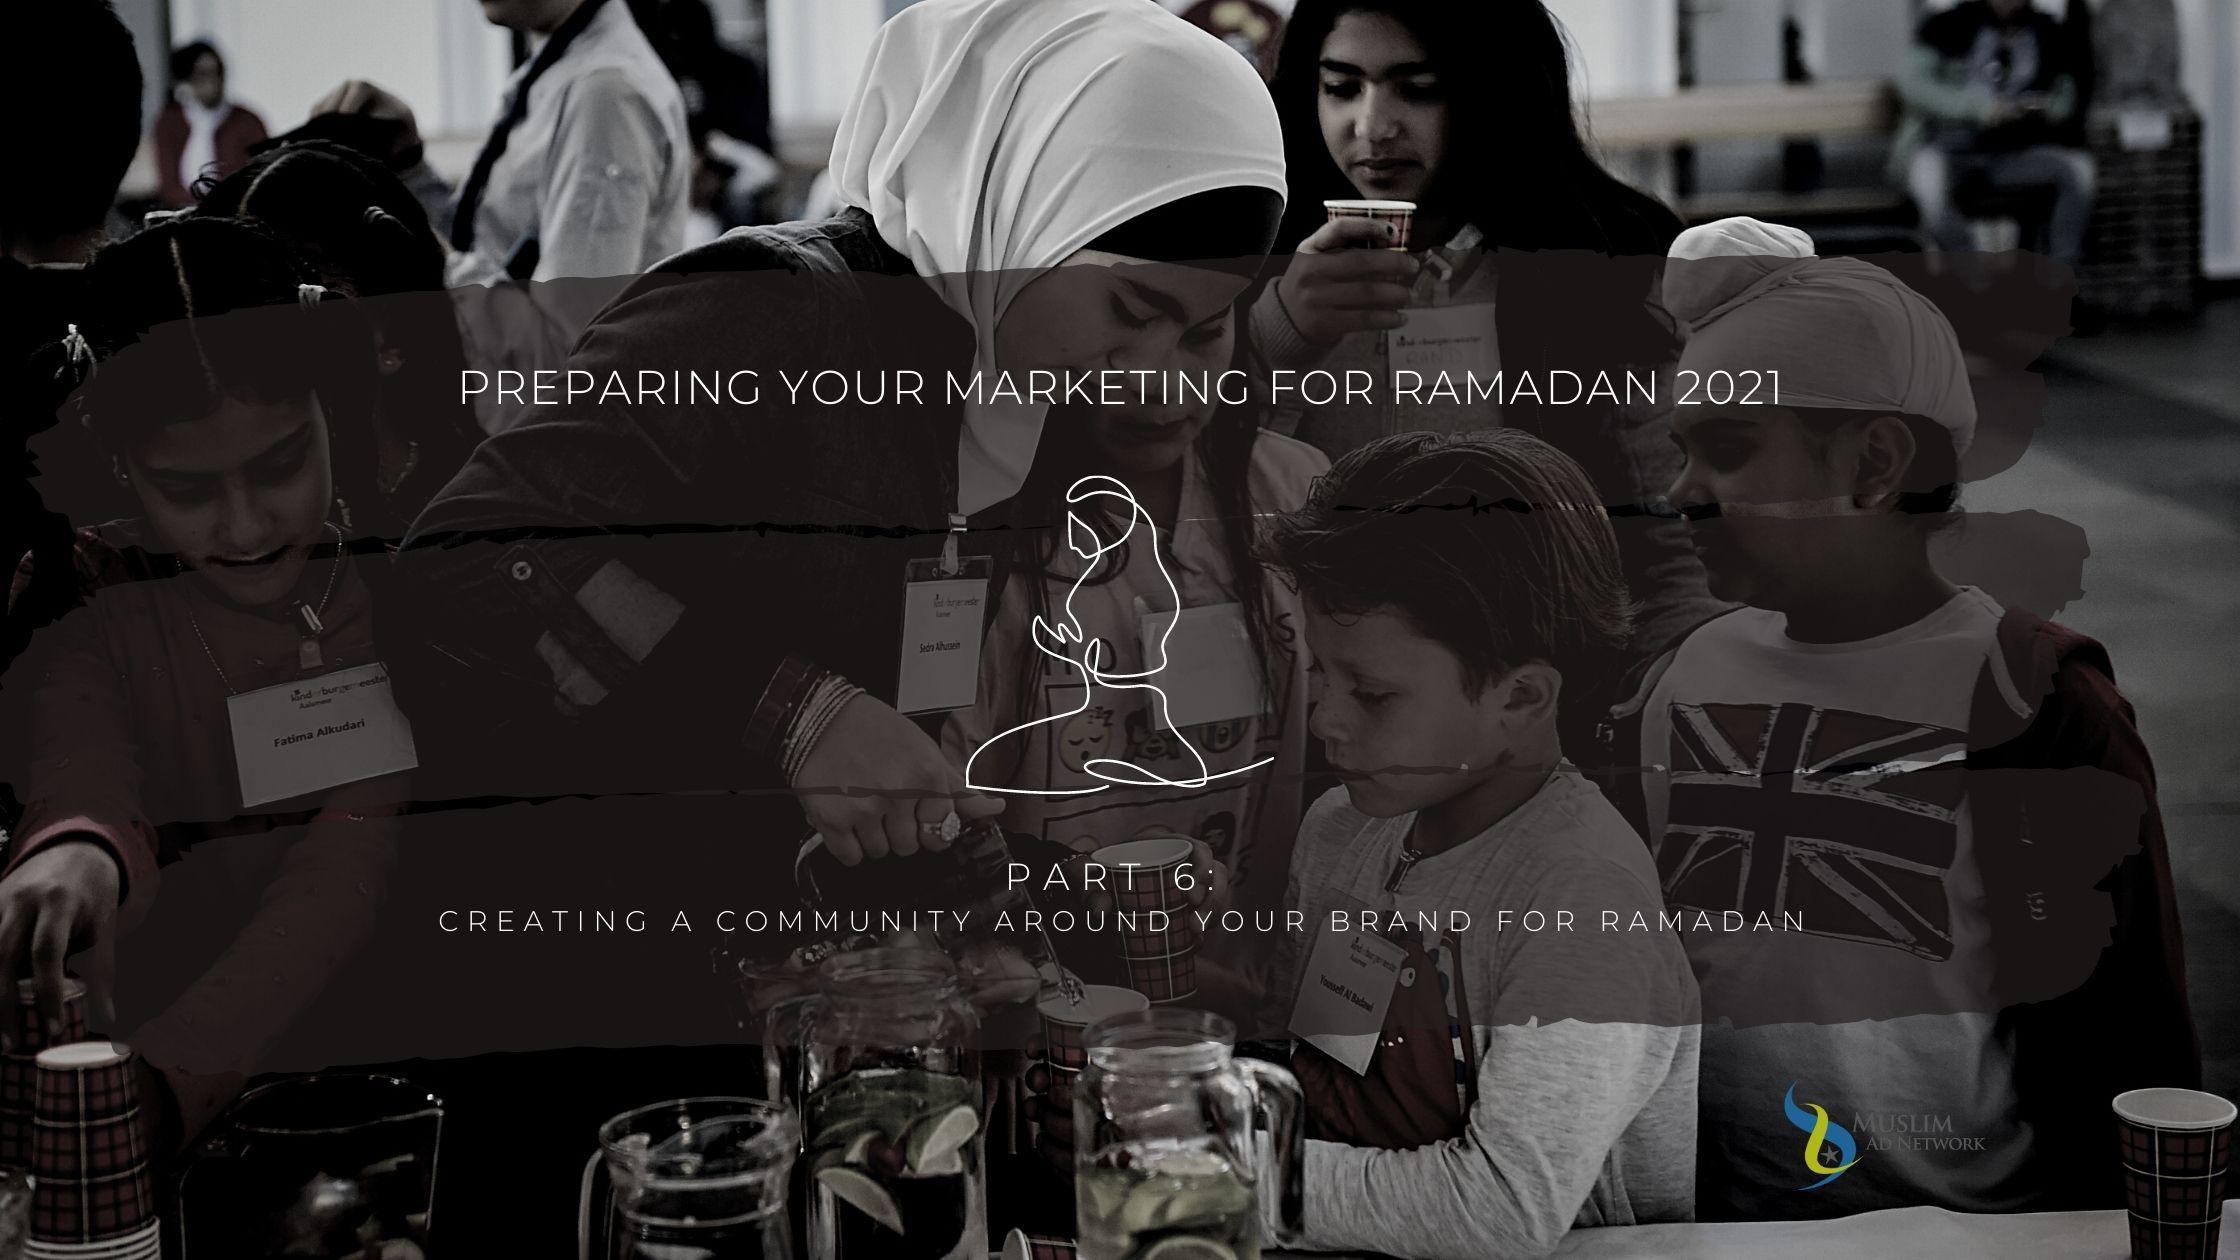 Marketing to Muslims in Ramadan